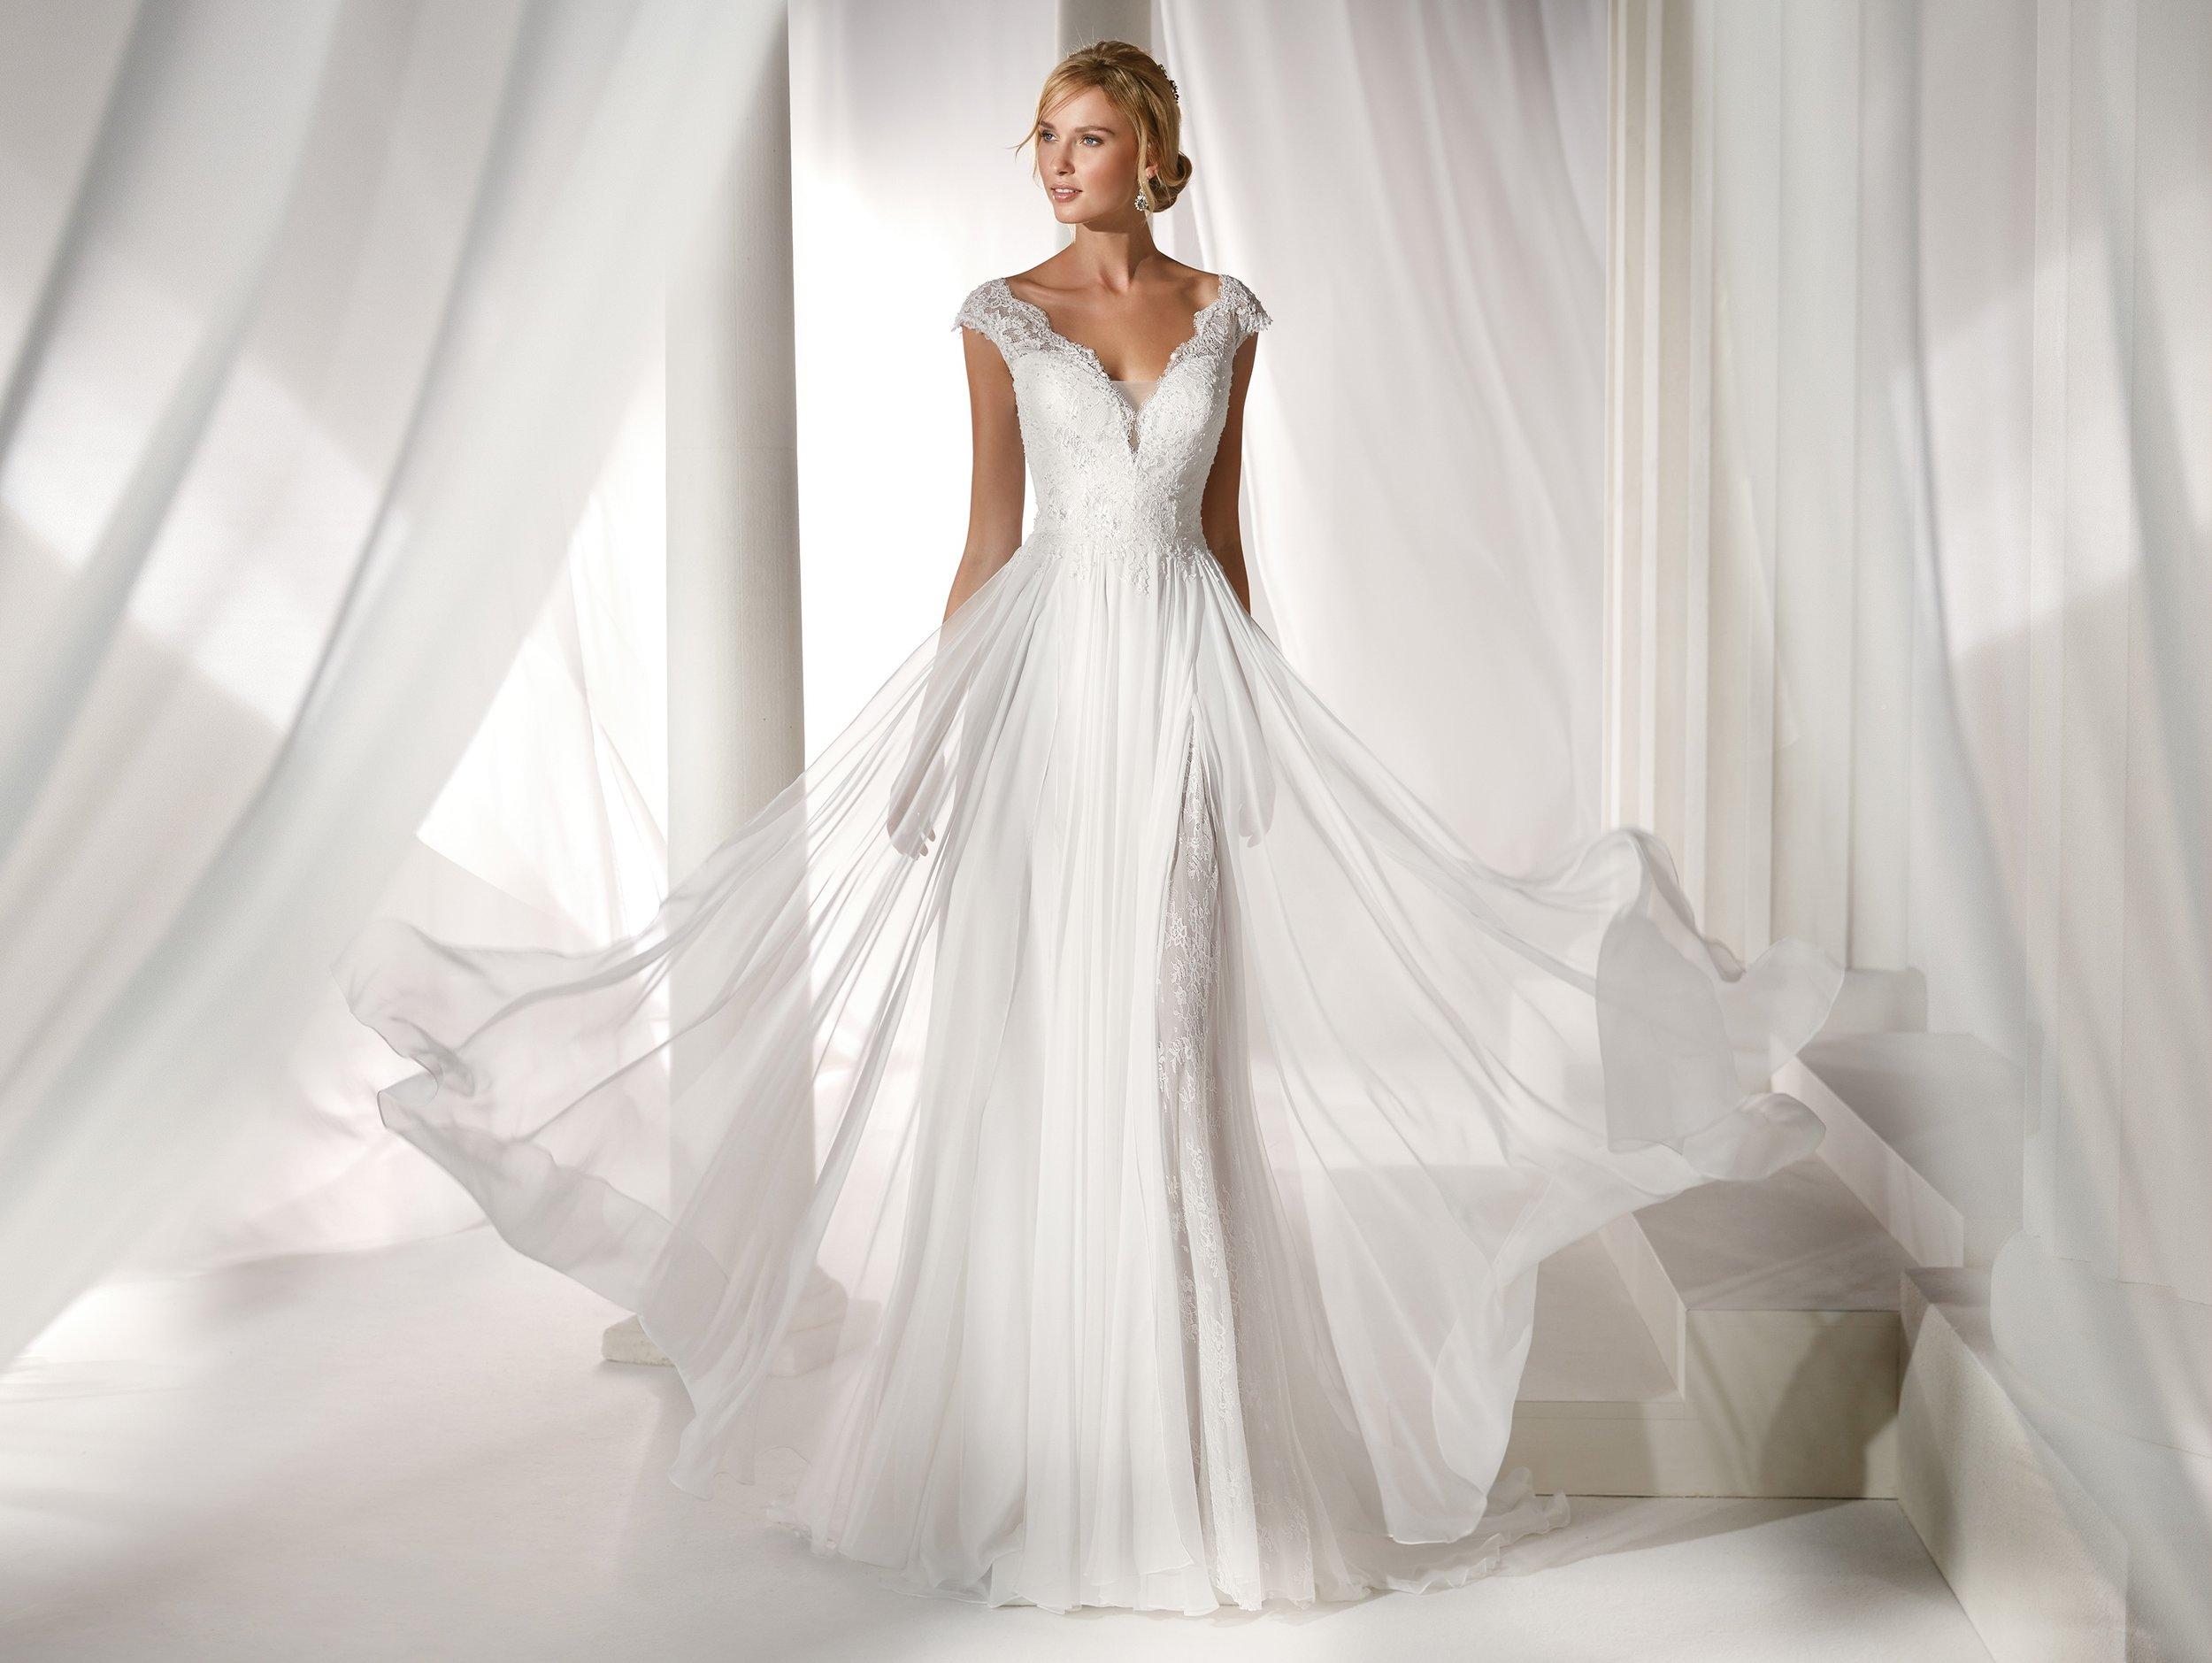 nicole-spose-NIAB19012-Nicole-moda-sposa-2019-931.jpg